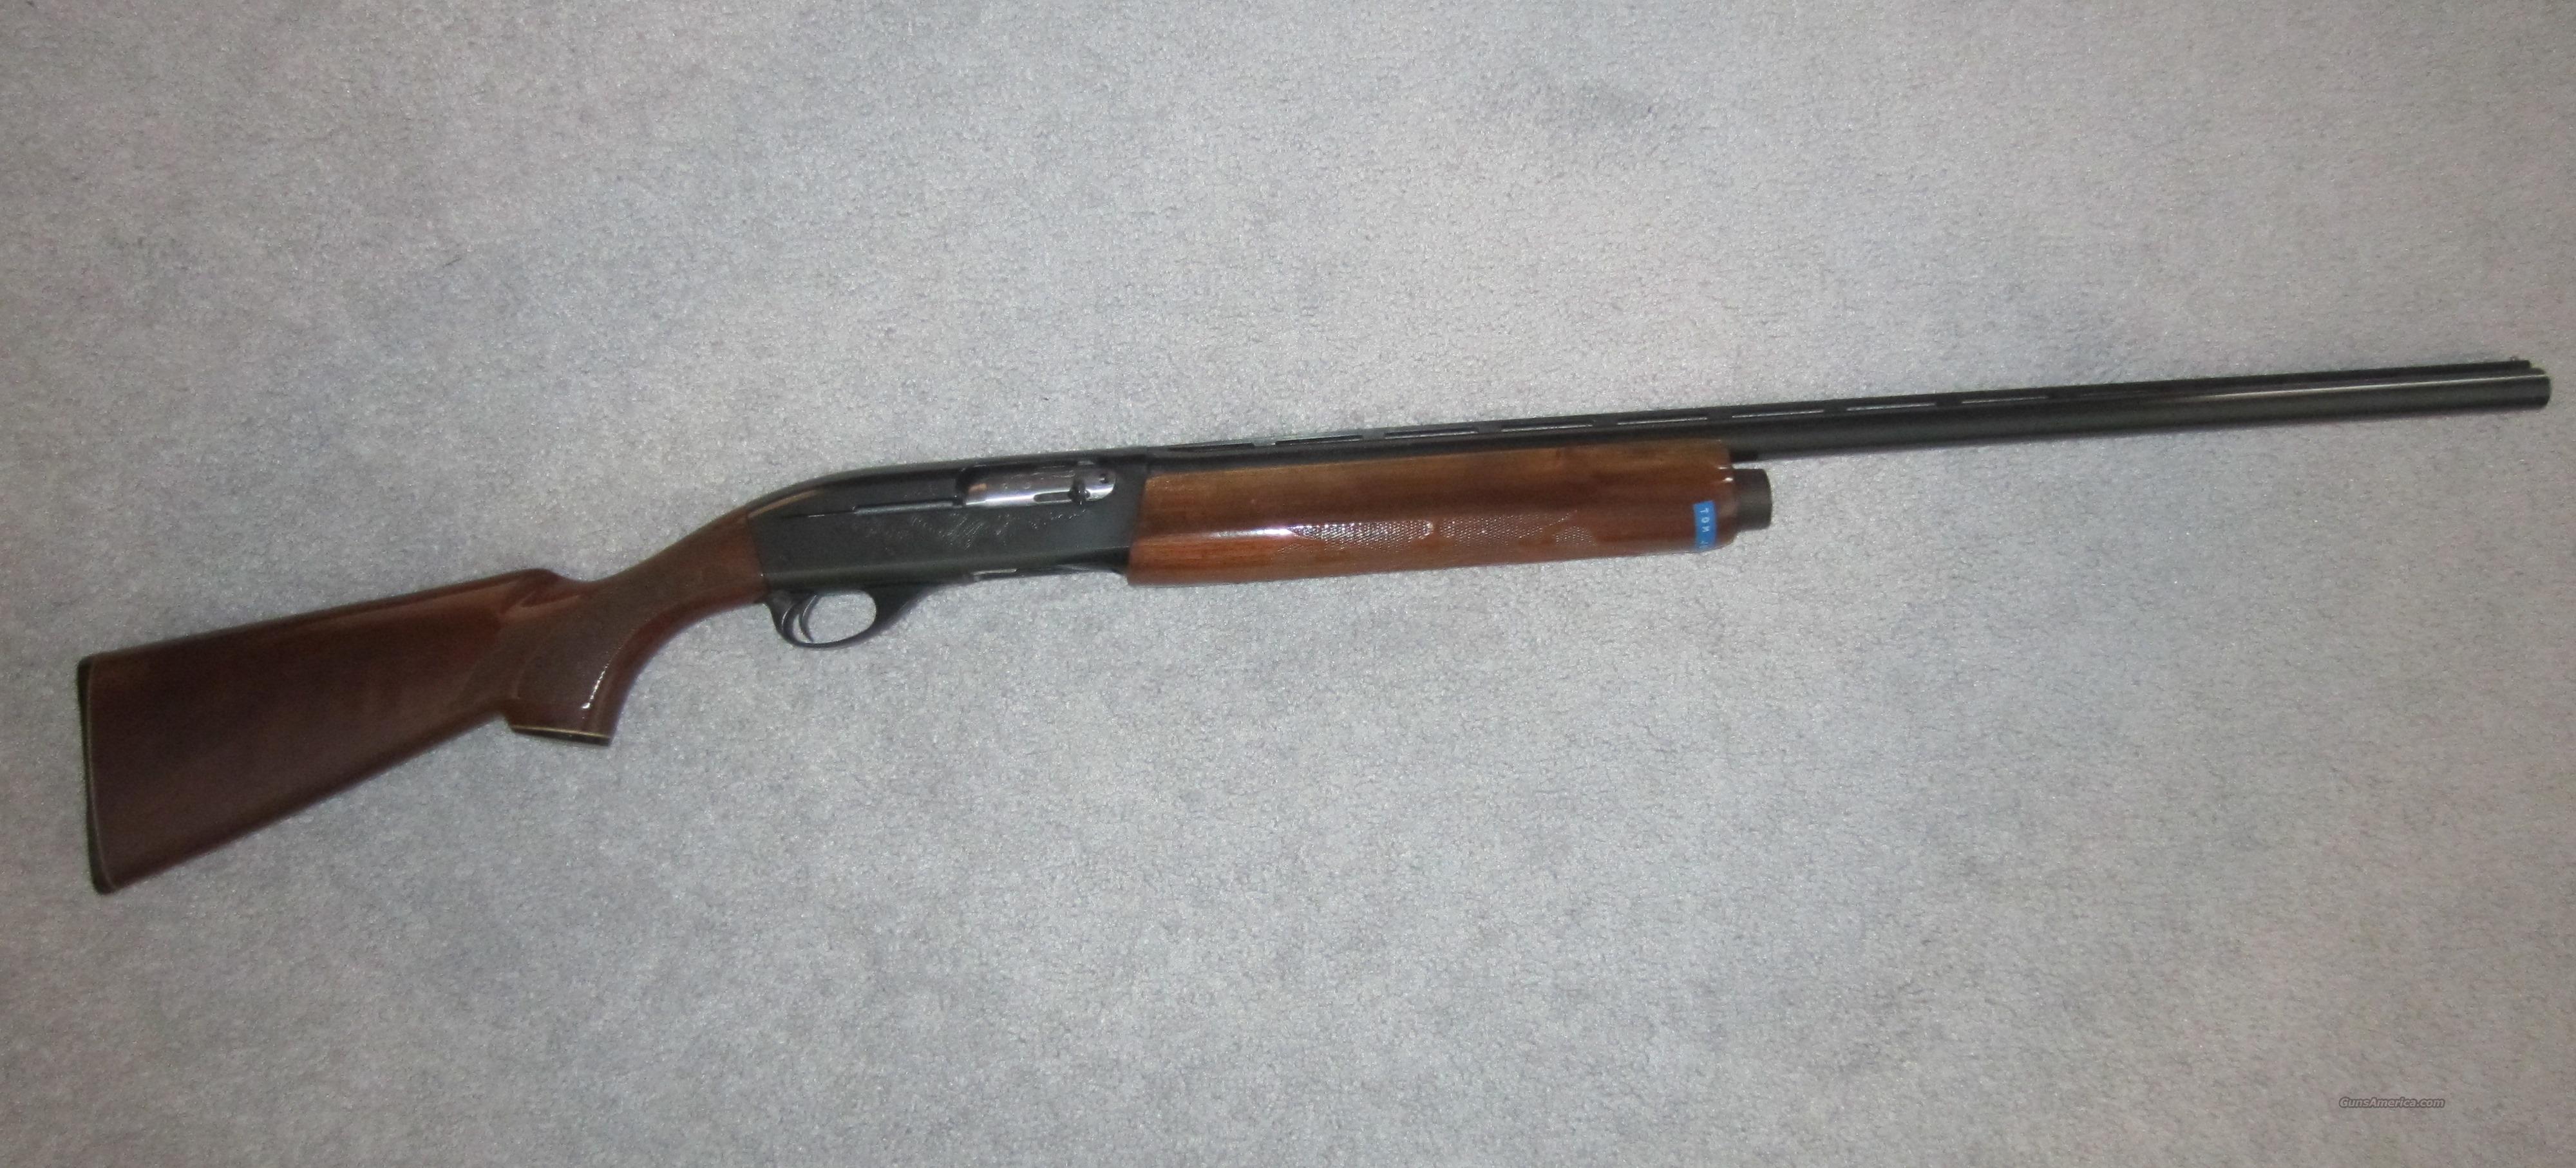 Remington Model 1100 Field, 12 gauge Shotgun for sale